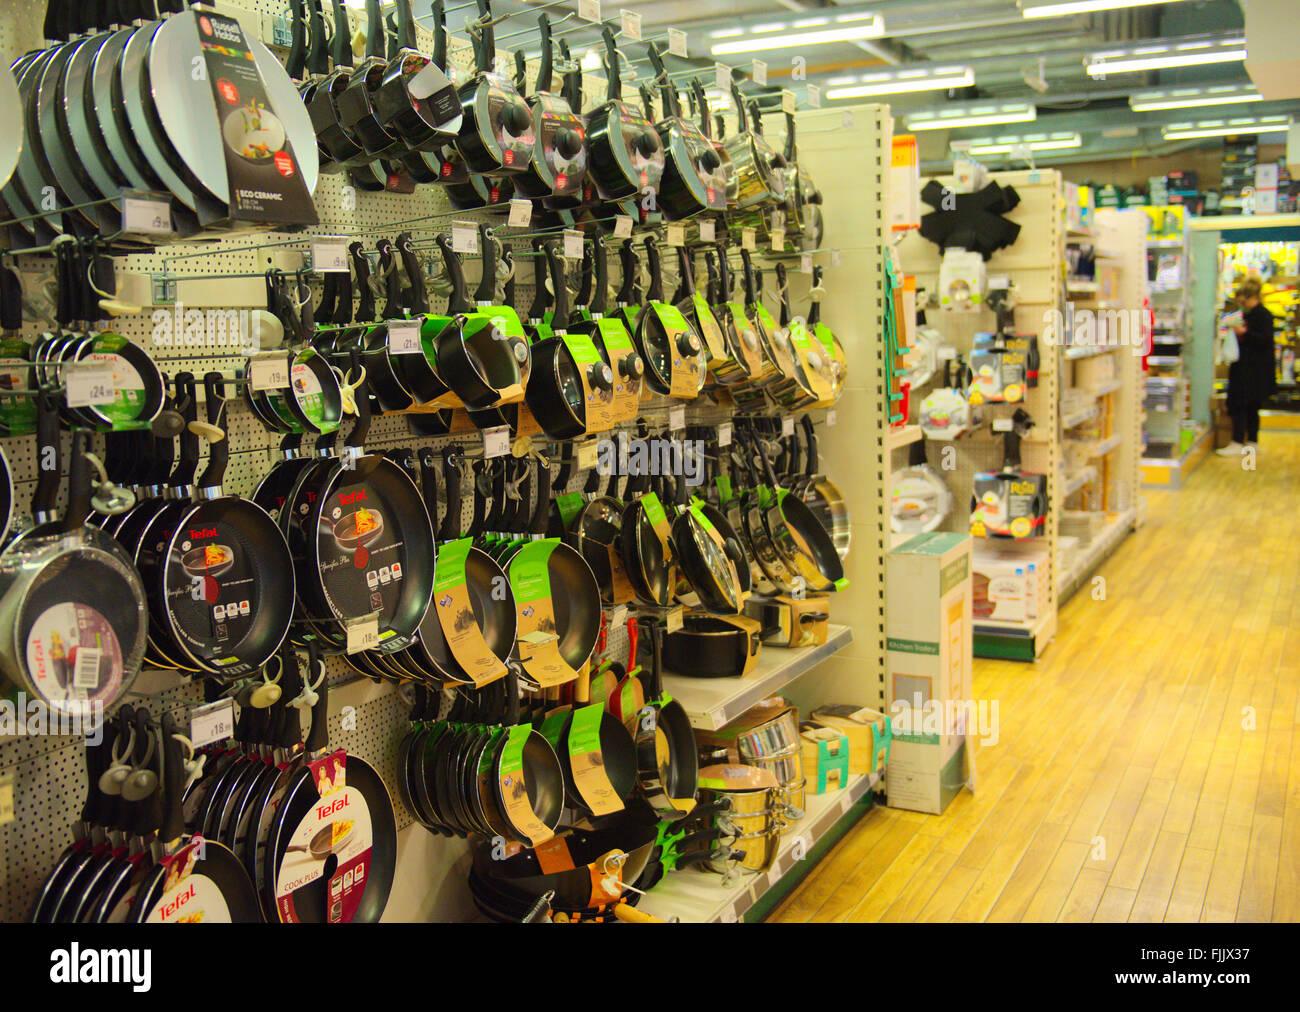 Pots Pans On Sale In Stockfotos & Pots Pans On Sale In Bilder - Alamy